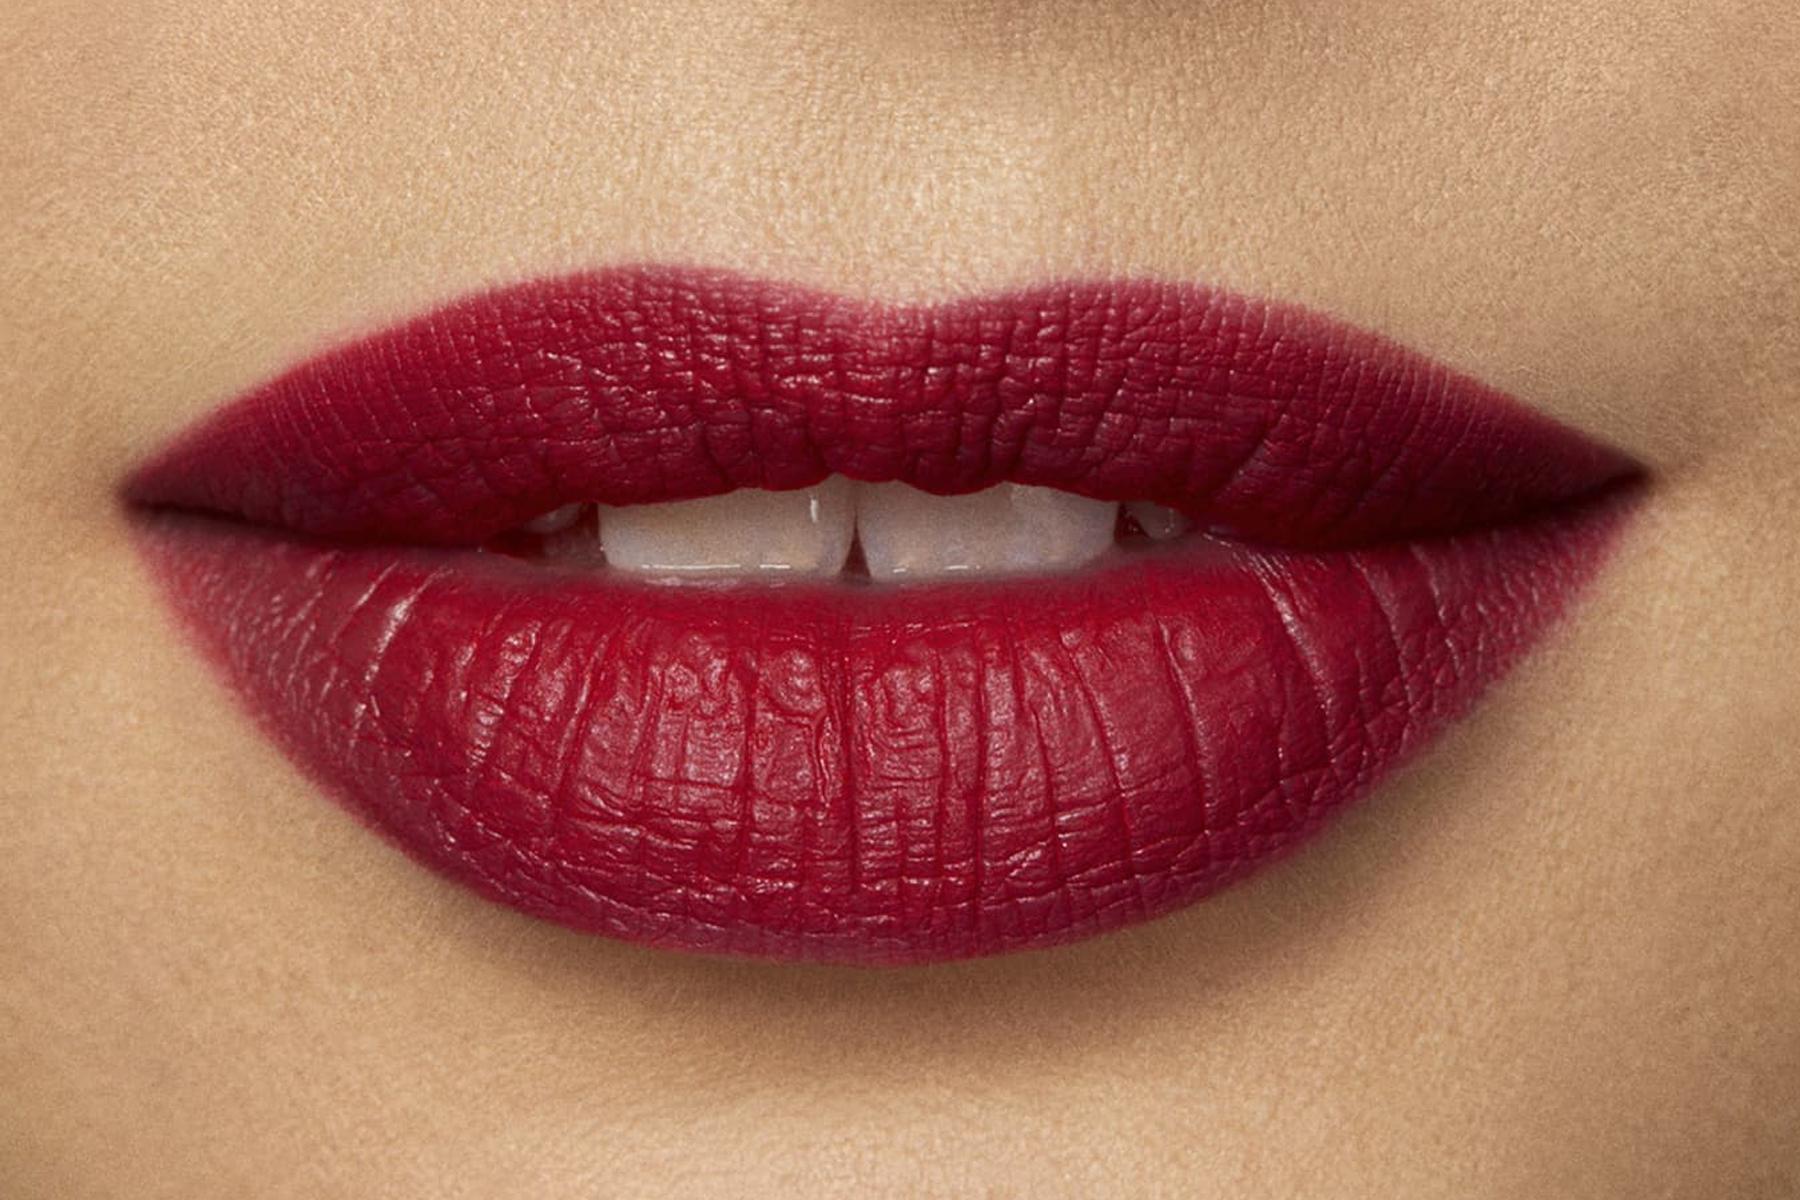 laura-mercier-rouge-essentiel-rouge-muse-swatch